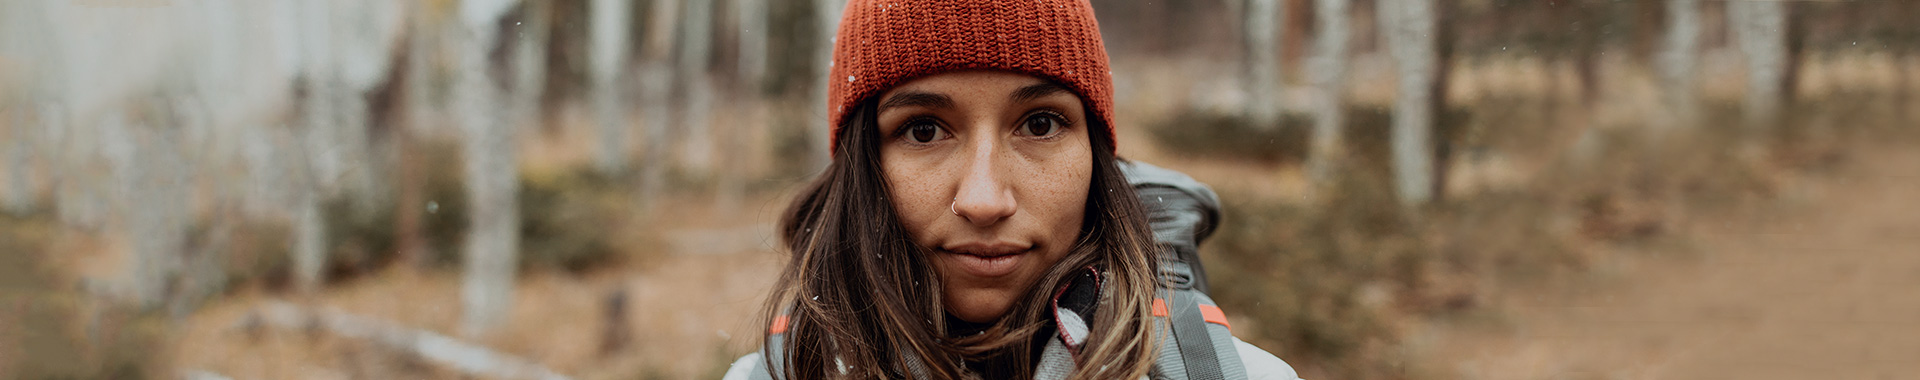 Woman wearing a Sierra Designs jacket in the forest